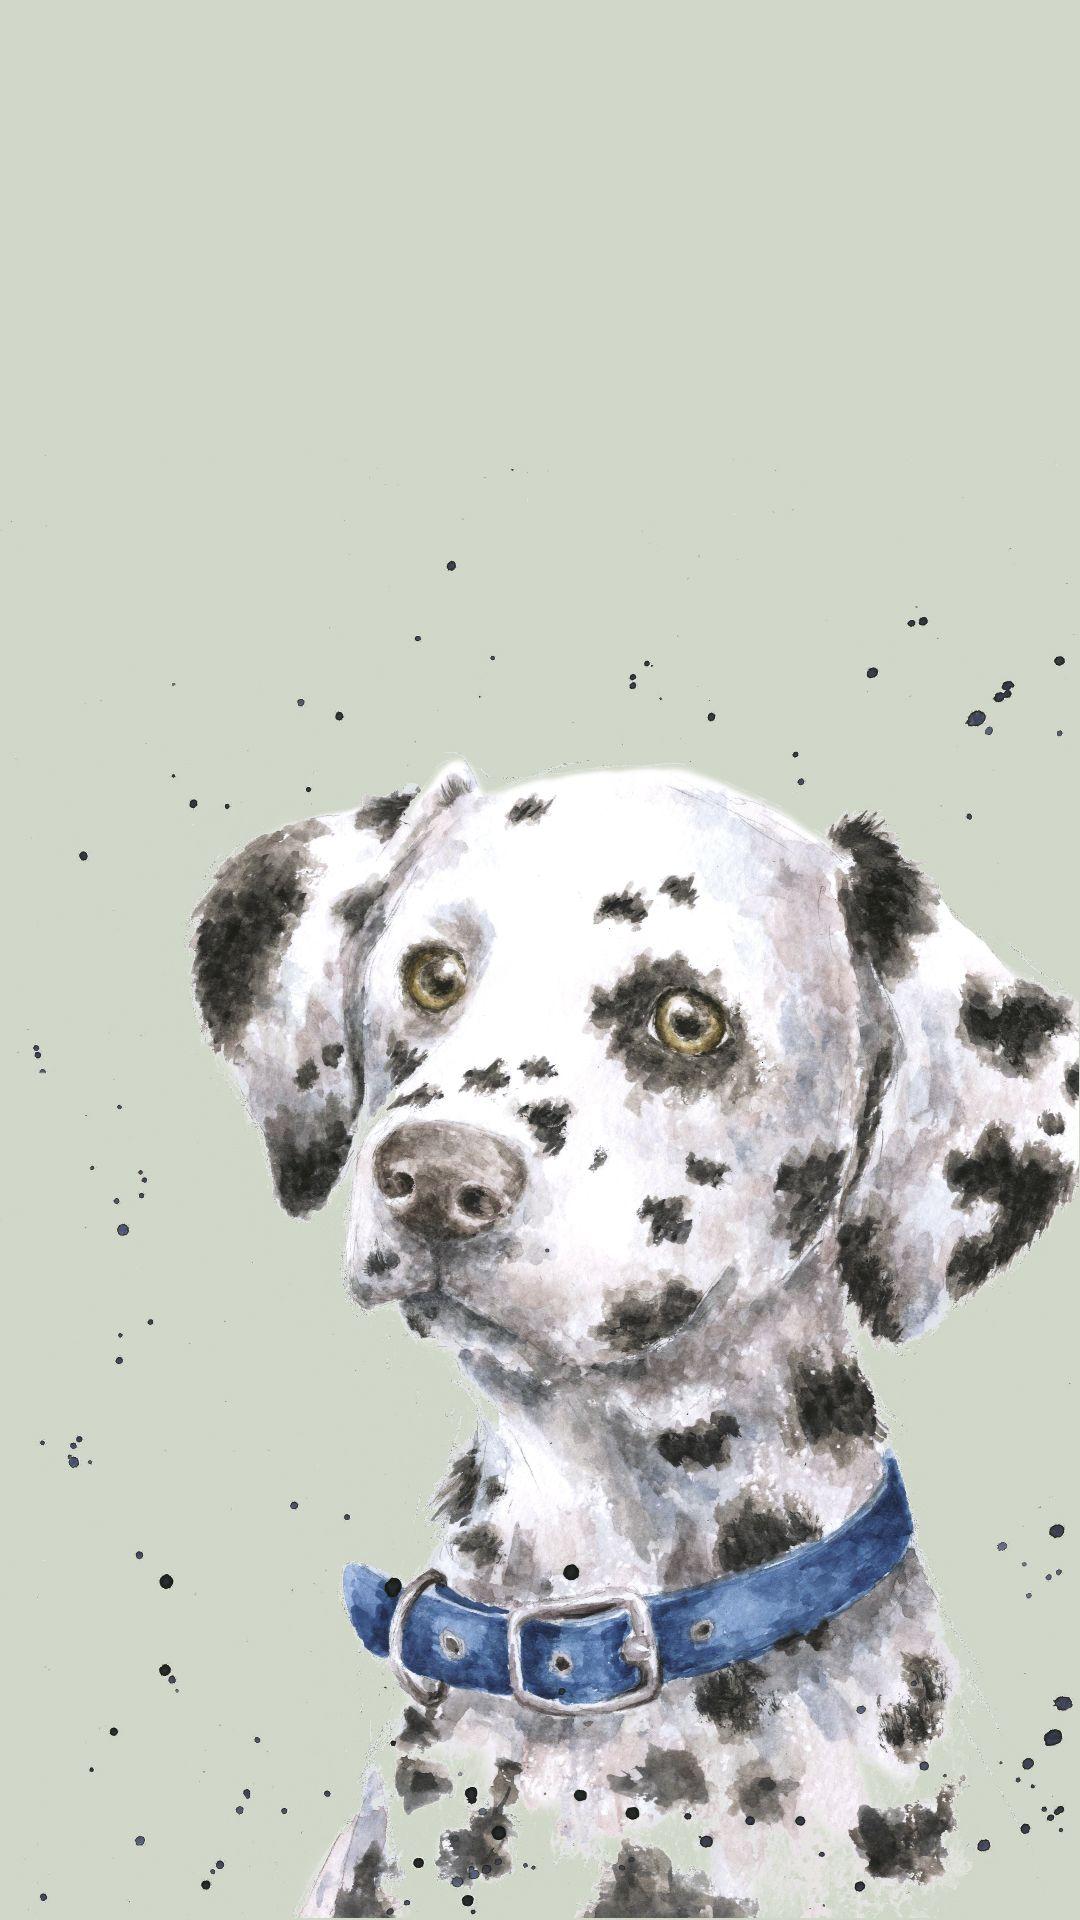 Dog wallpaper, Dalmatian dogs